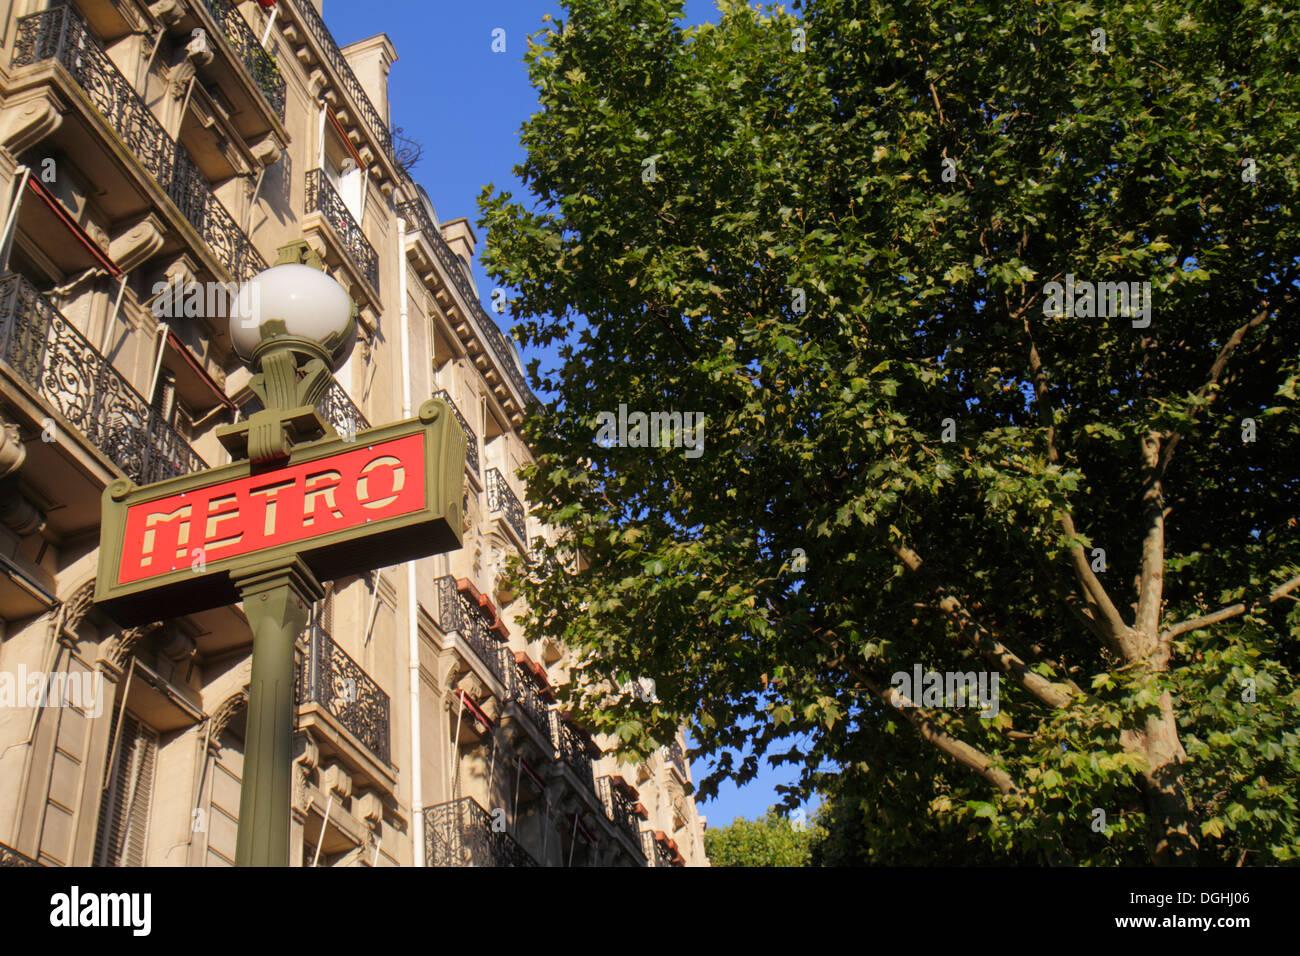 Paris France Europe French 8th arrondissement Place Alma Alma Marceau Metro Station Line 9 subway public transportation sign ent - Stock Image